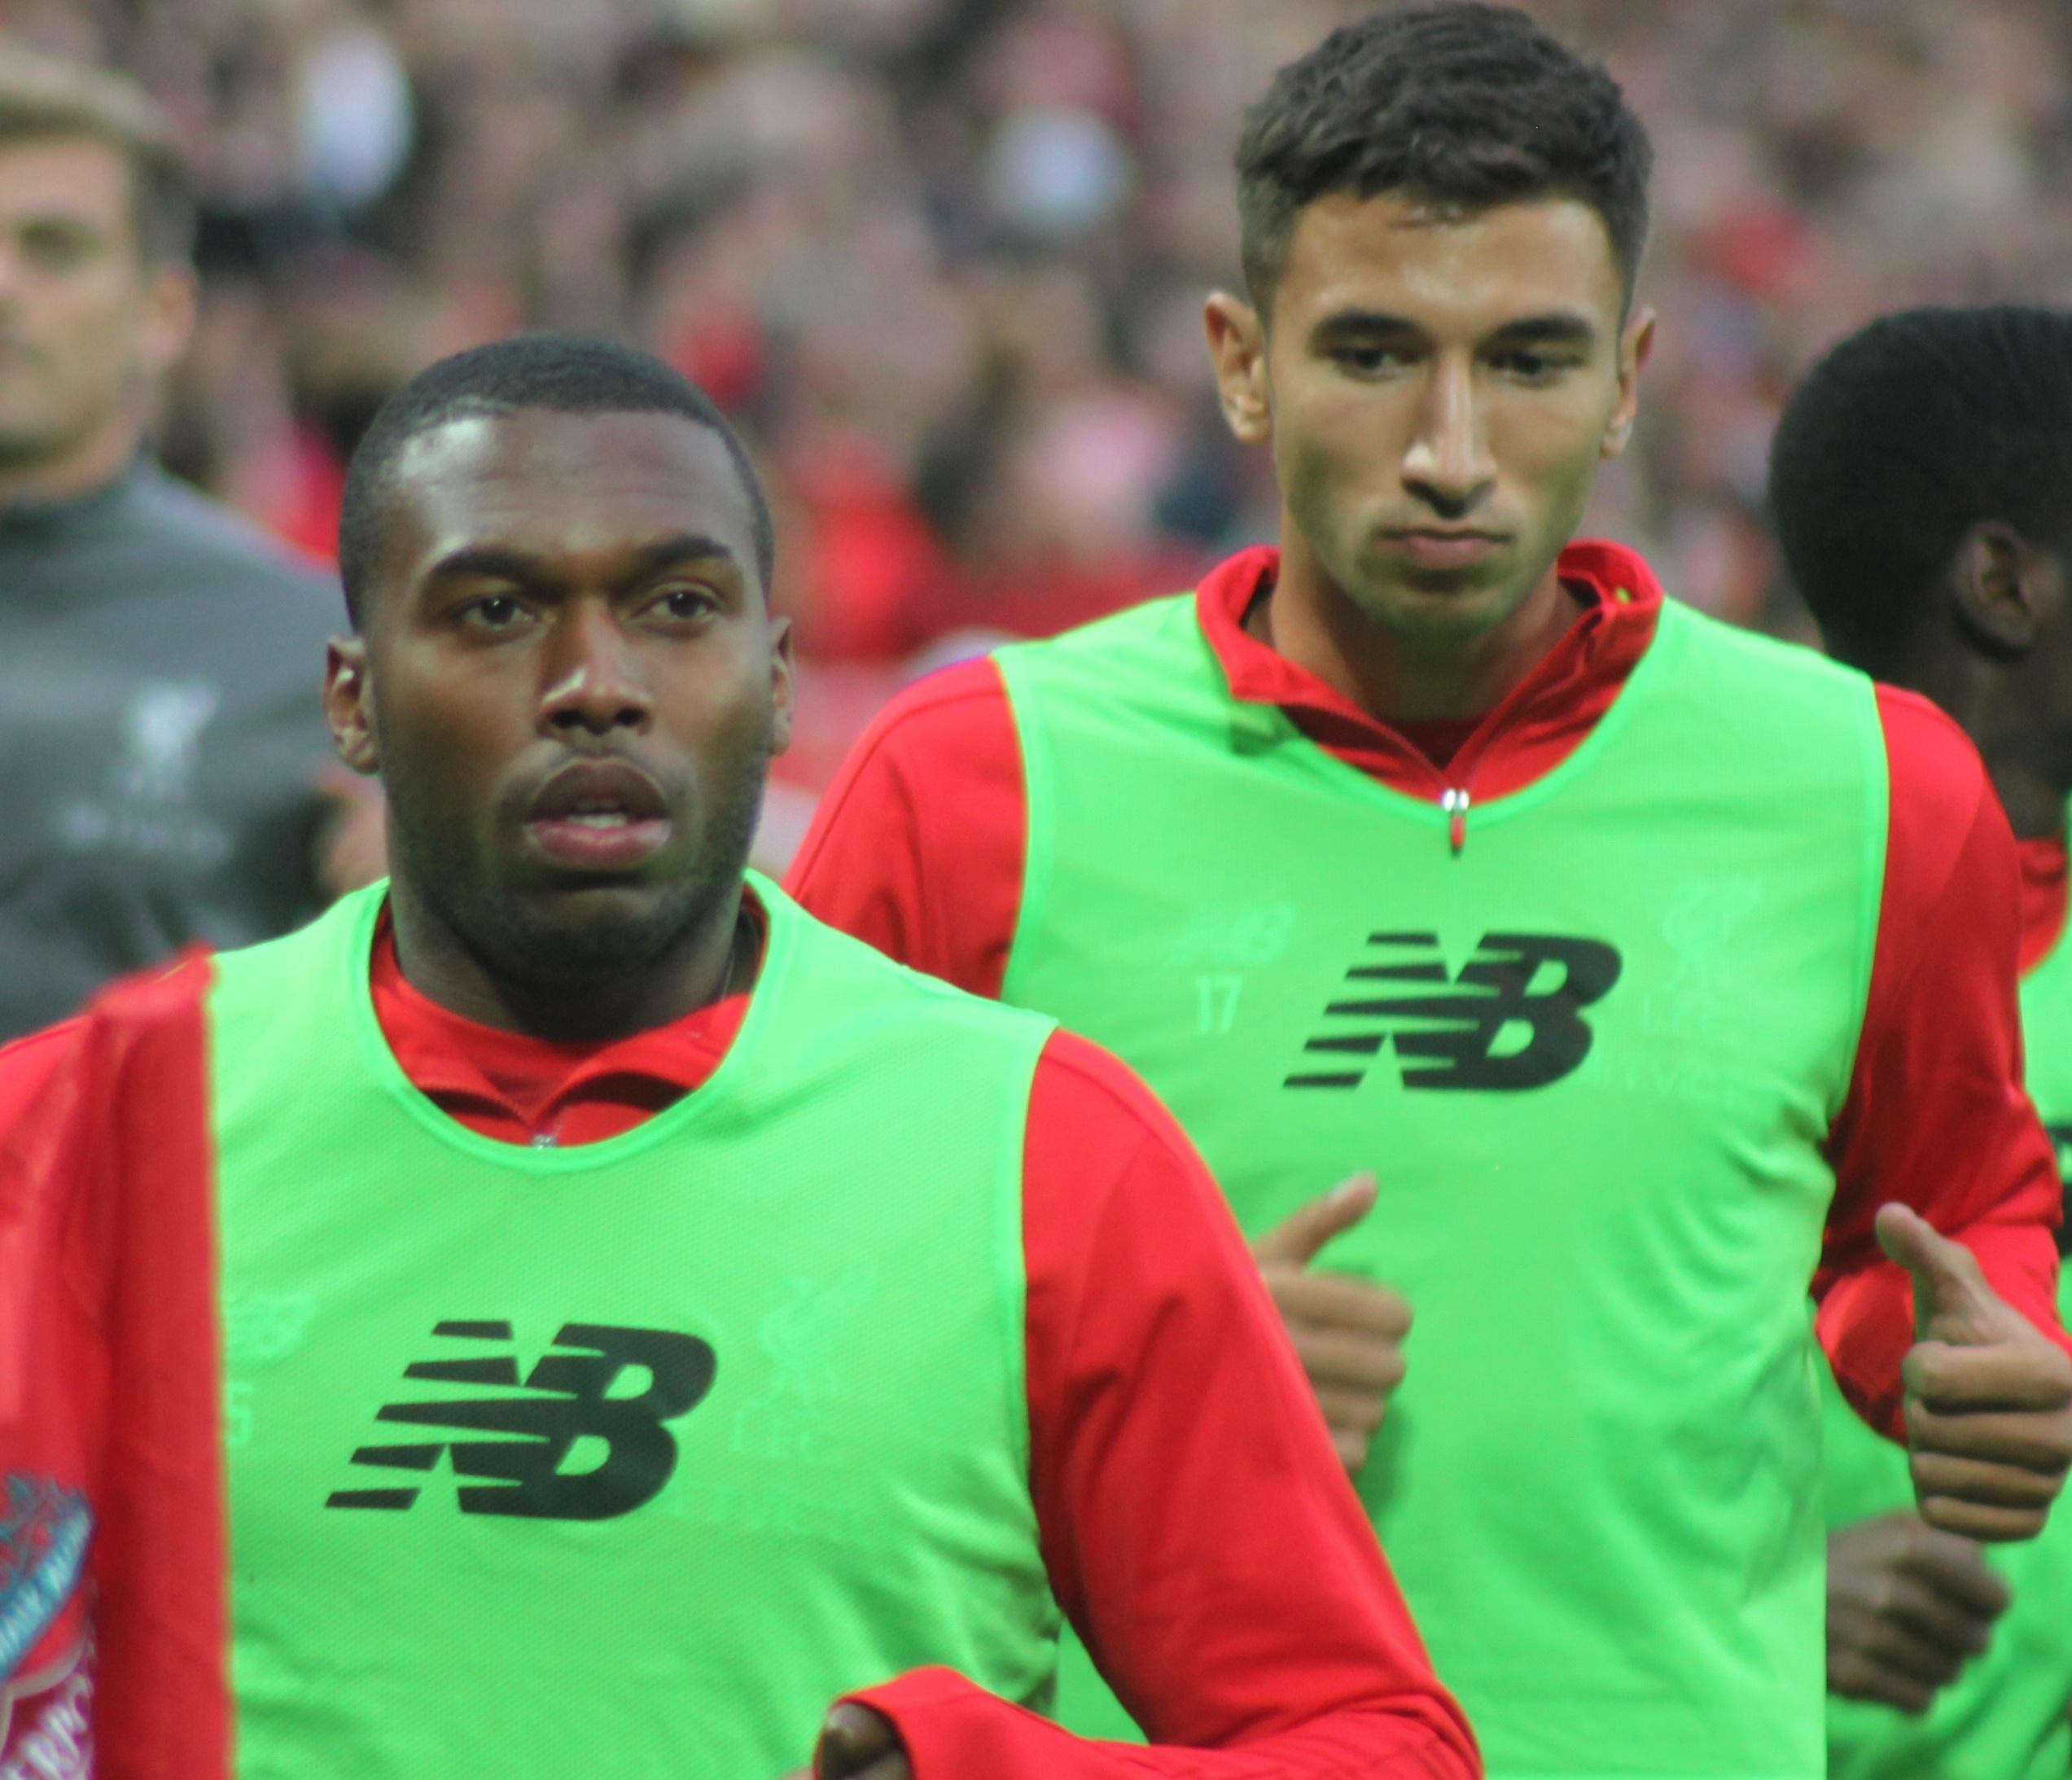 Hertha se prepara para presentar una nueva oferta para adquirir Grujic